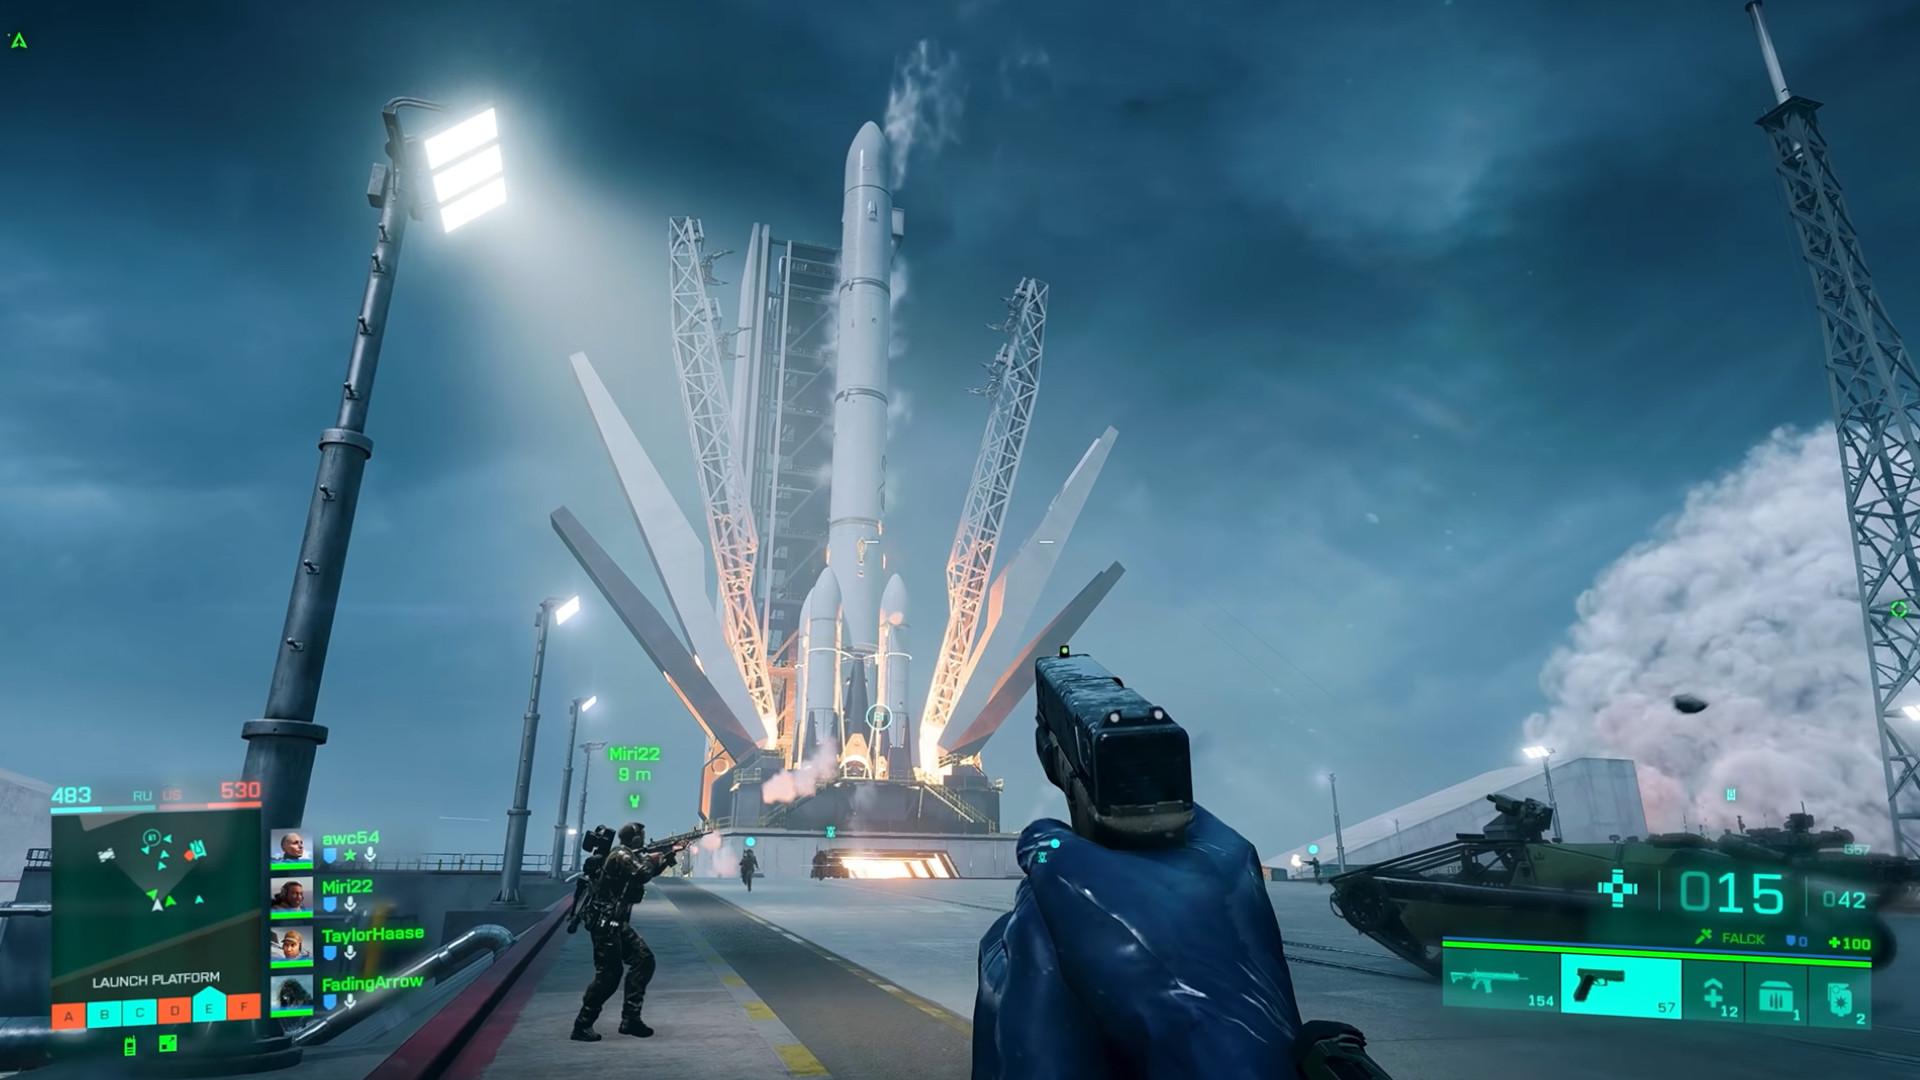 The Battlefield 2042 open beta hits Steam, Origin, and Epic next week